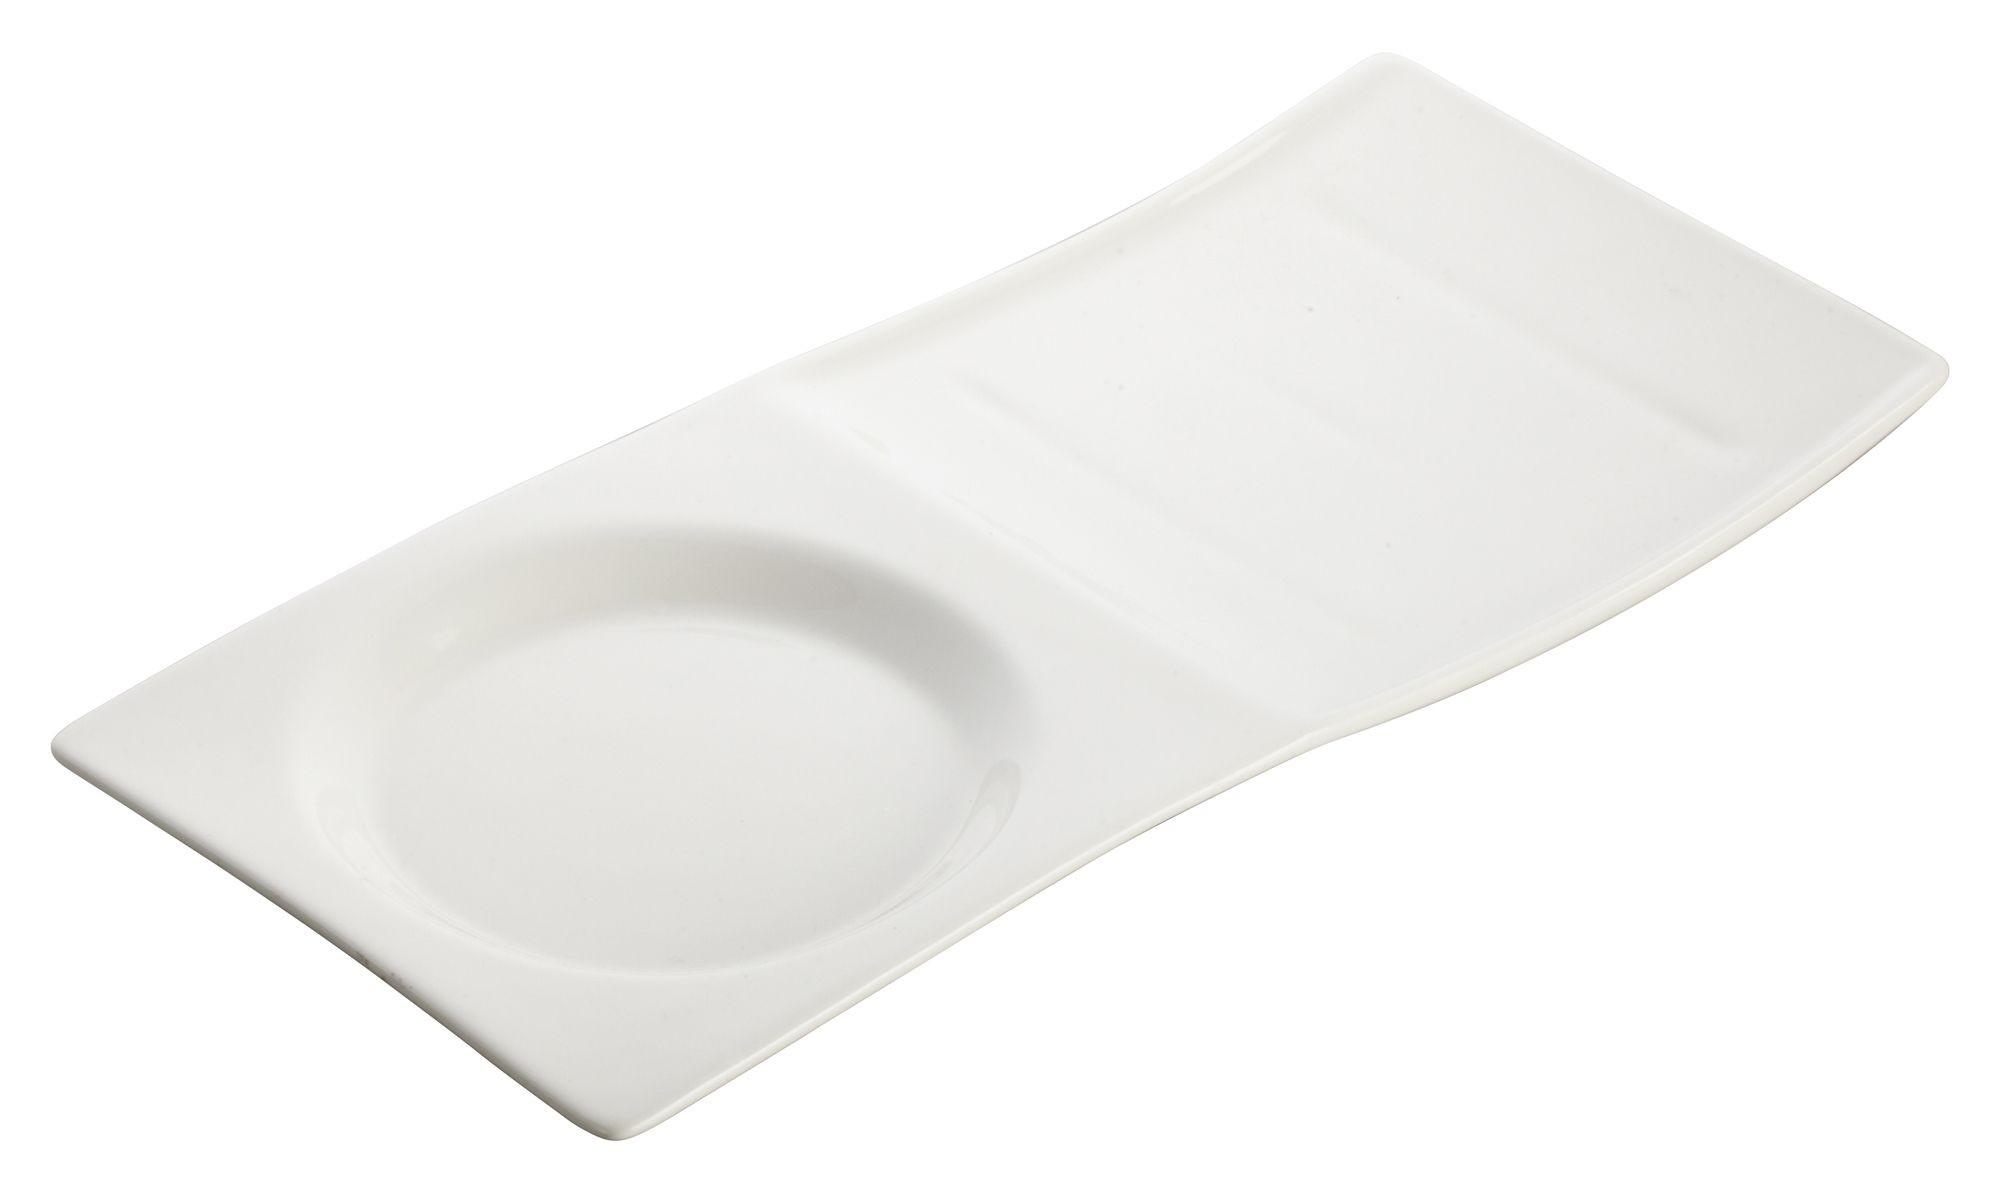 "Winco WDP012-102 Tenora Porcelain Bright White Tray 10-1/2"" x 5"""